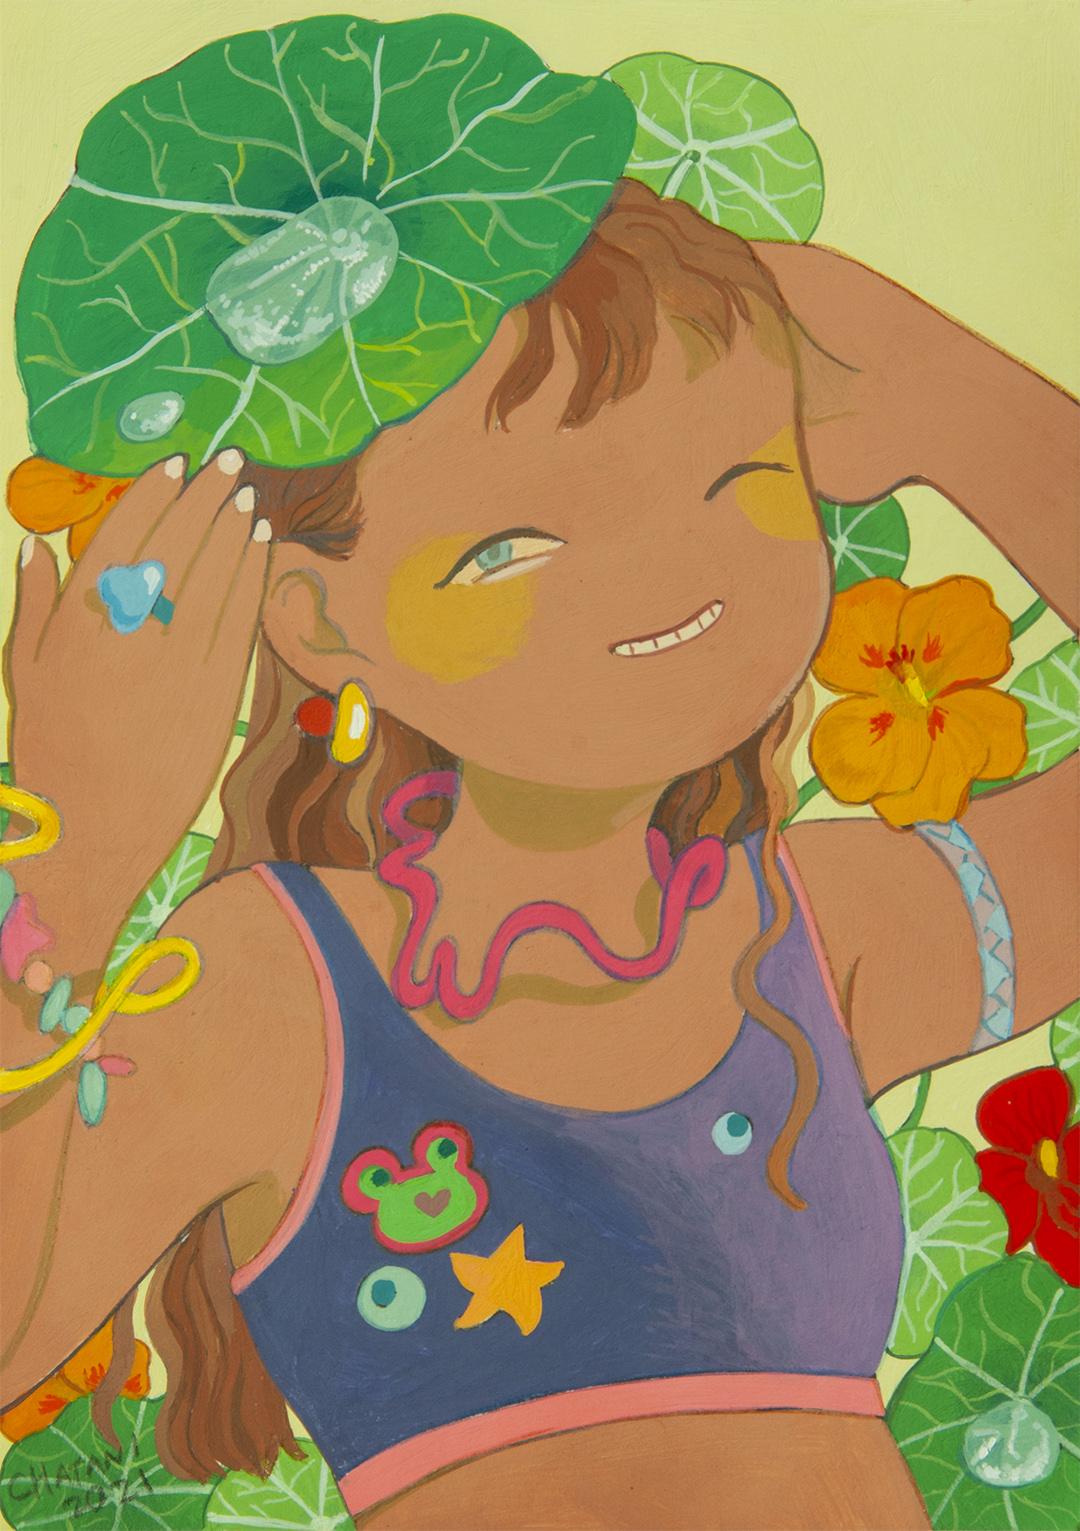 GirlsclubAsia-Artist-Hana Chatani-image 10